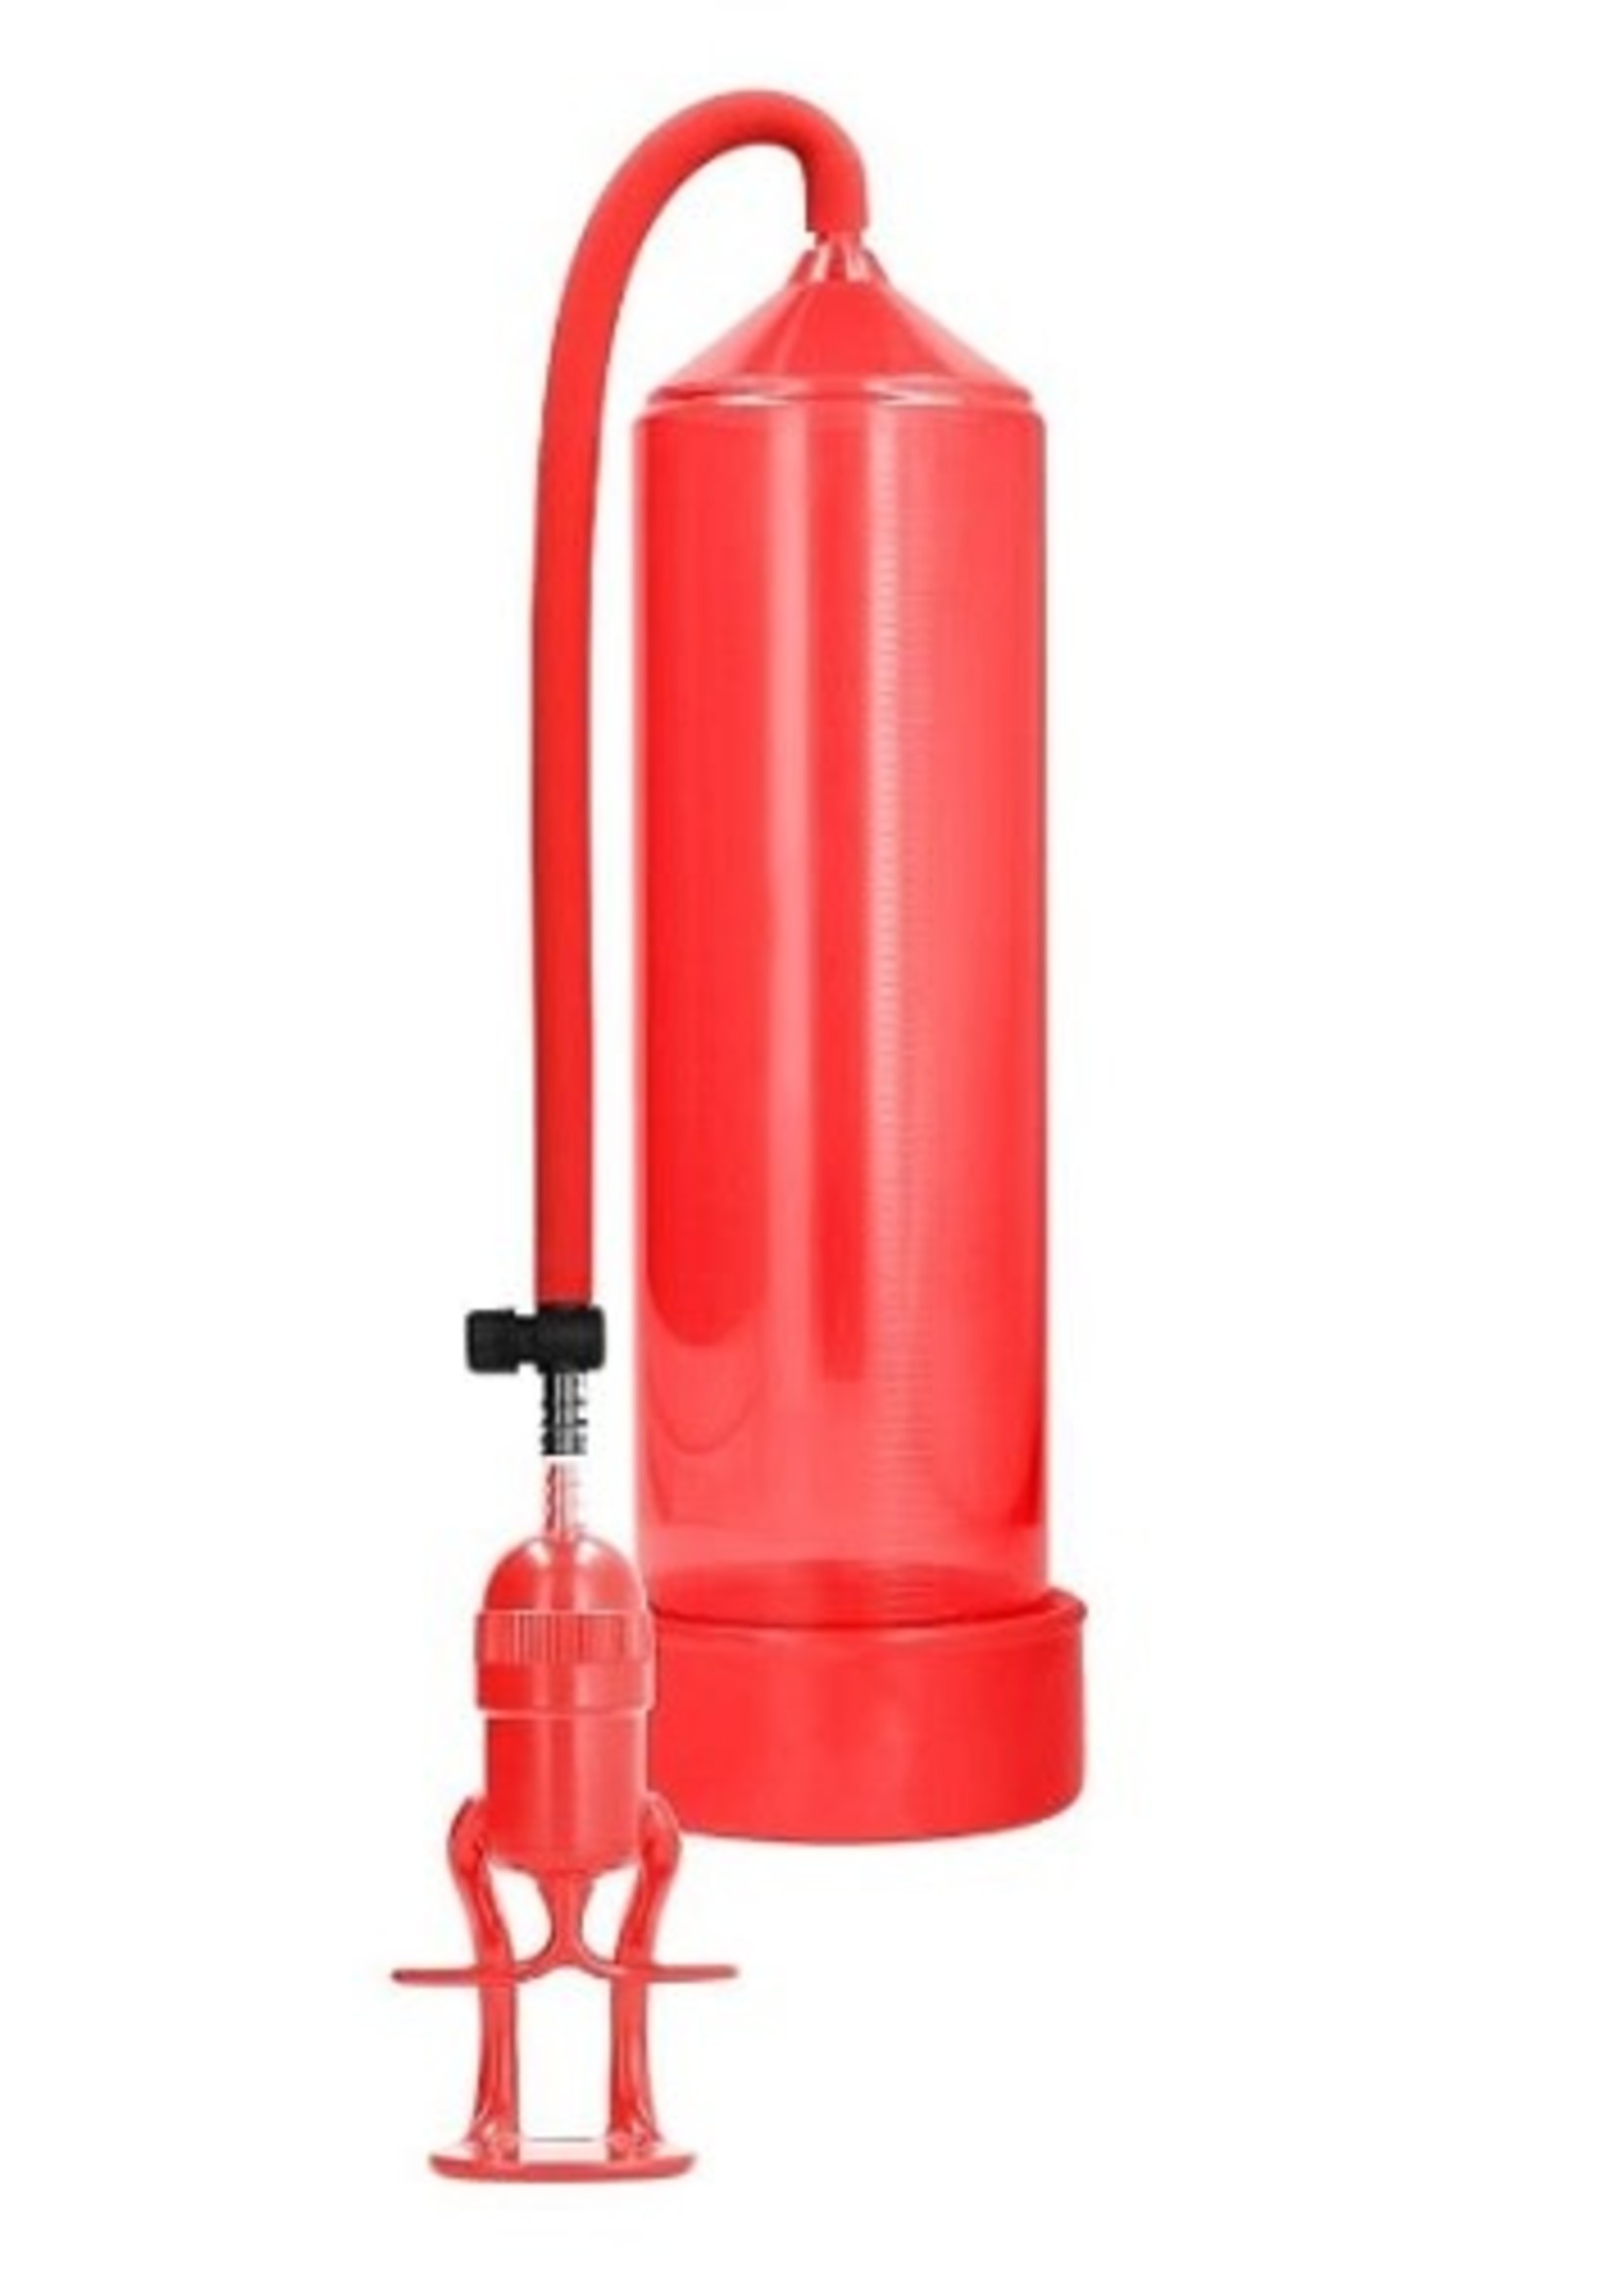 Pumped Deluxe Pump